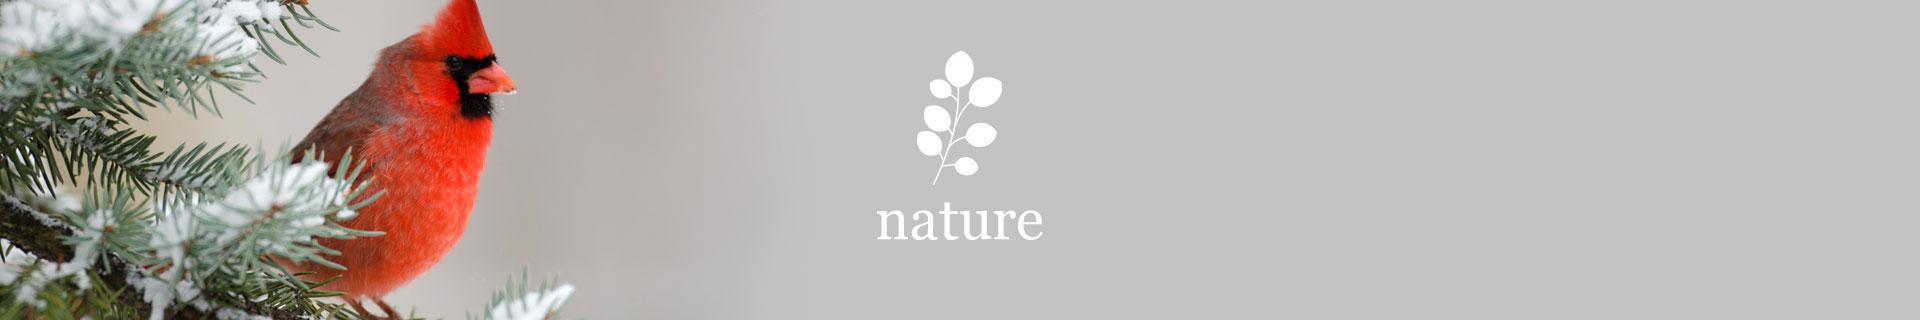 Kleinburg_nature2